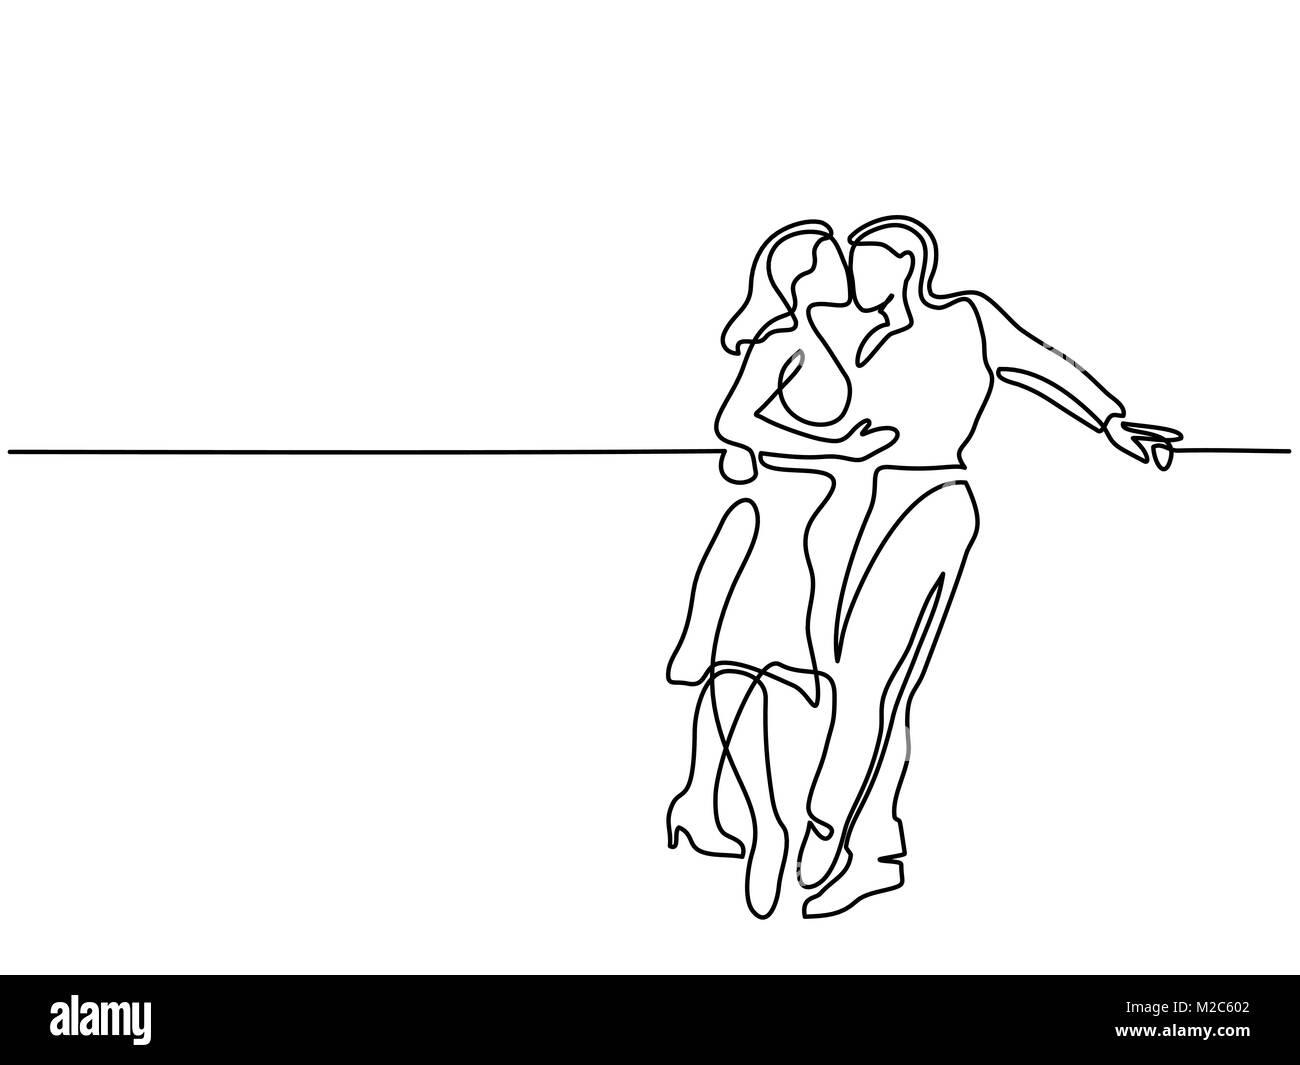 Happy couple kissing - Stock Image